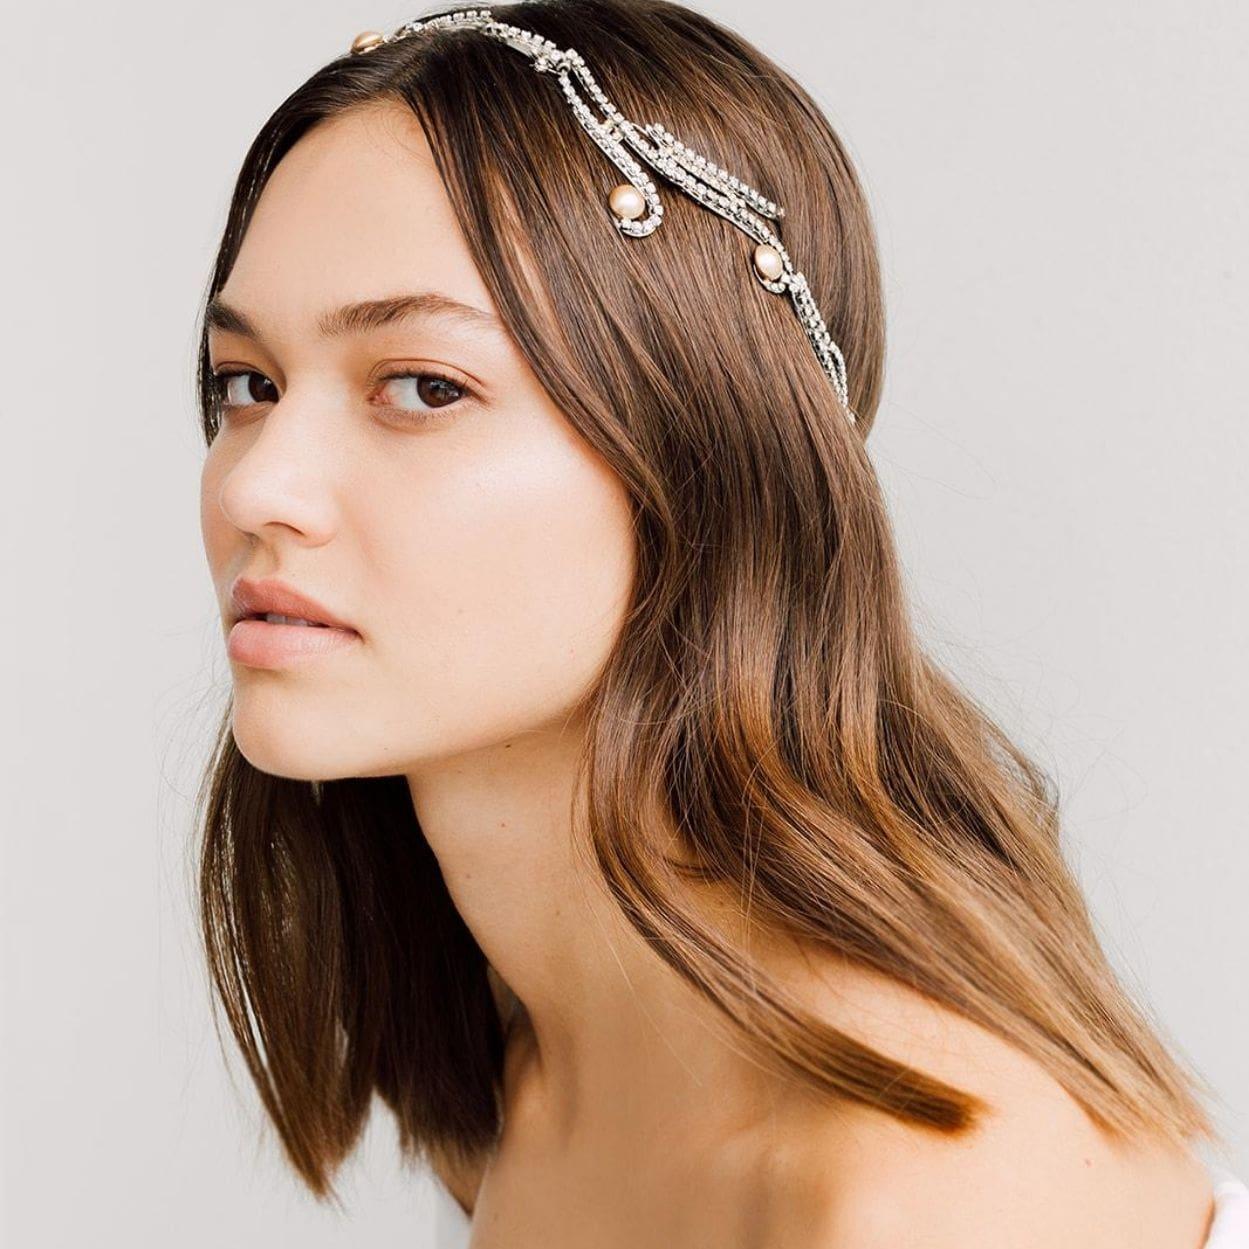 Personalized Tiara Headband